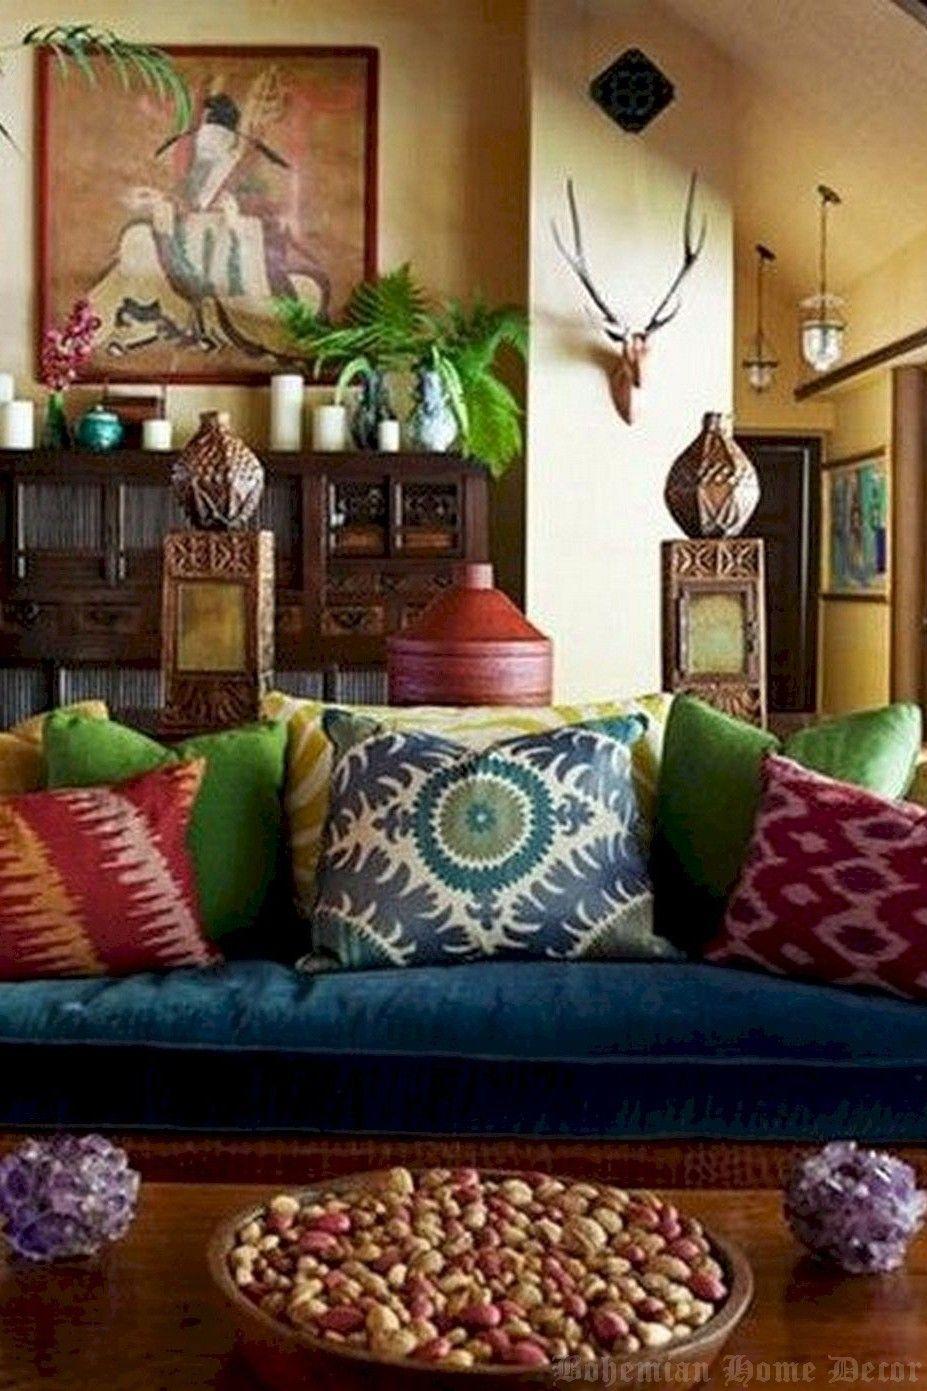 Bohemian Home Decor For Dollars Seminar